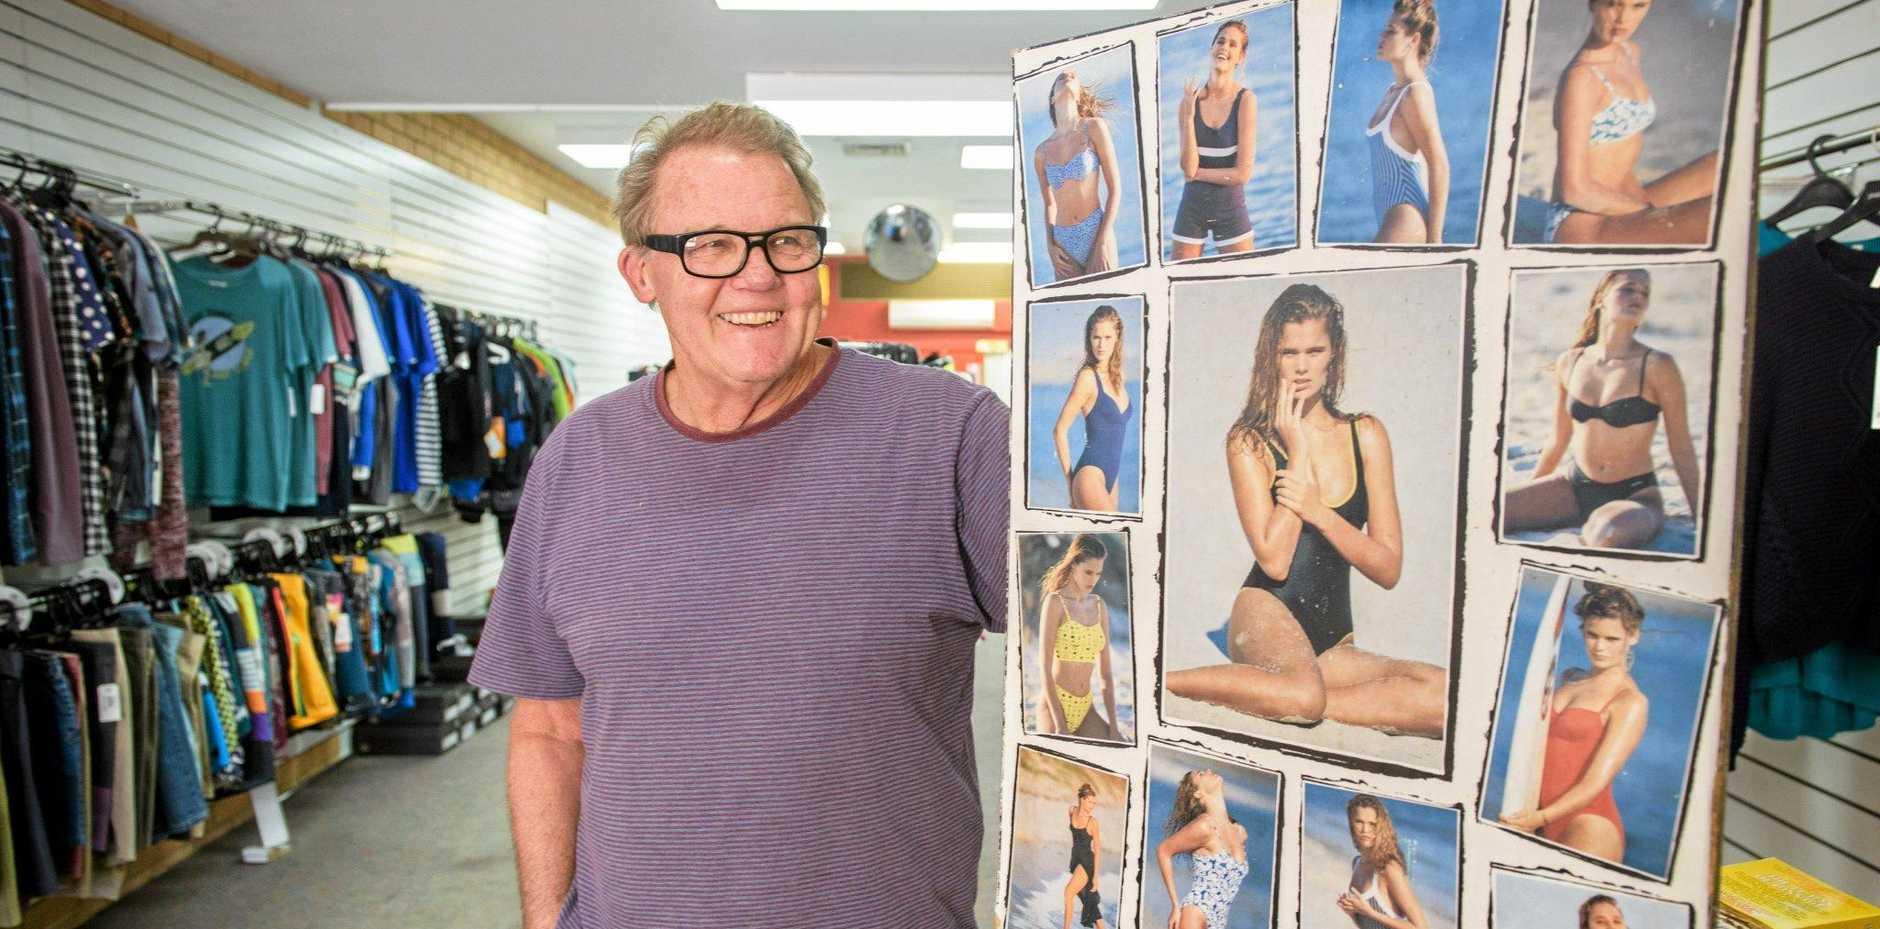 Grant Dwyer of Fandango with an old poster of their Fandango swimwear.